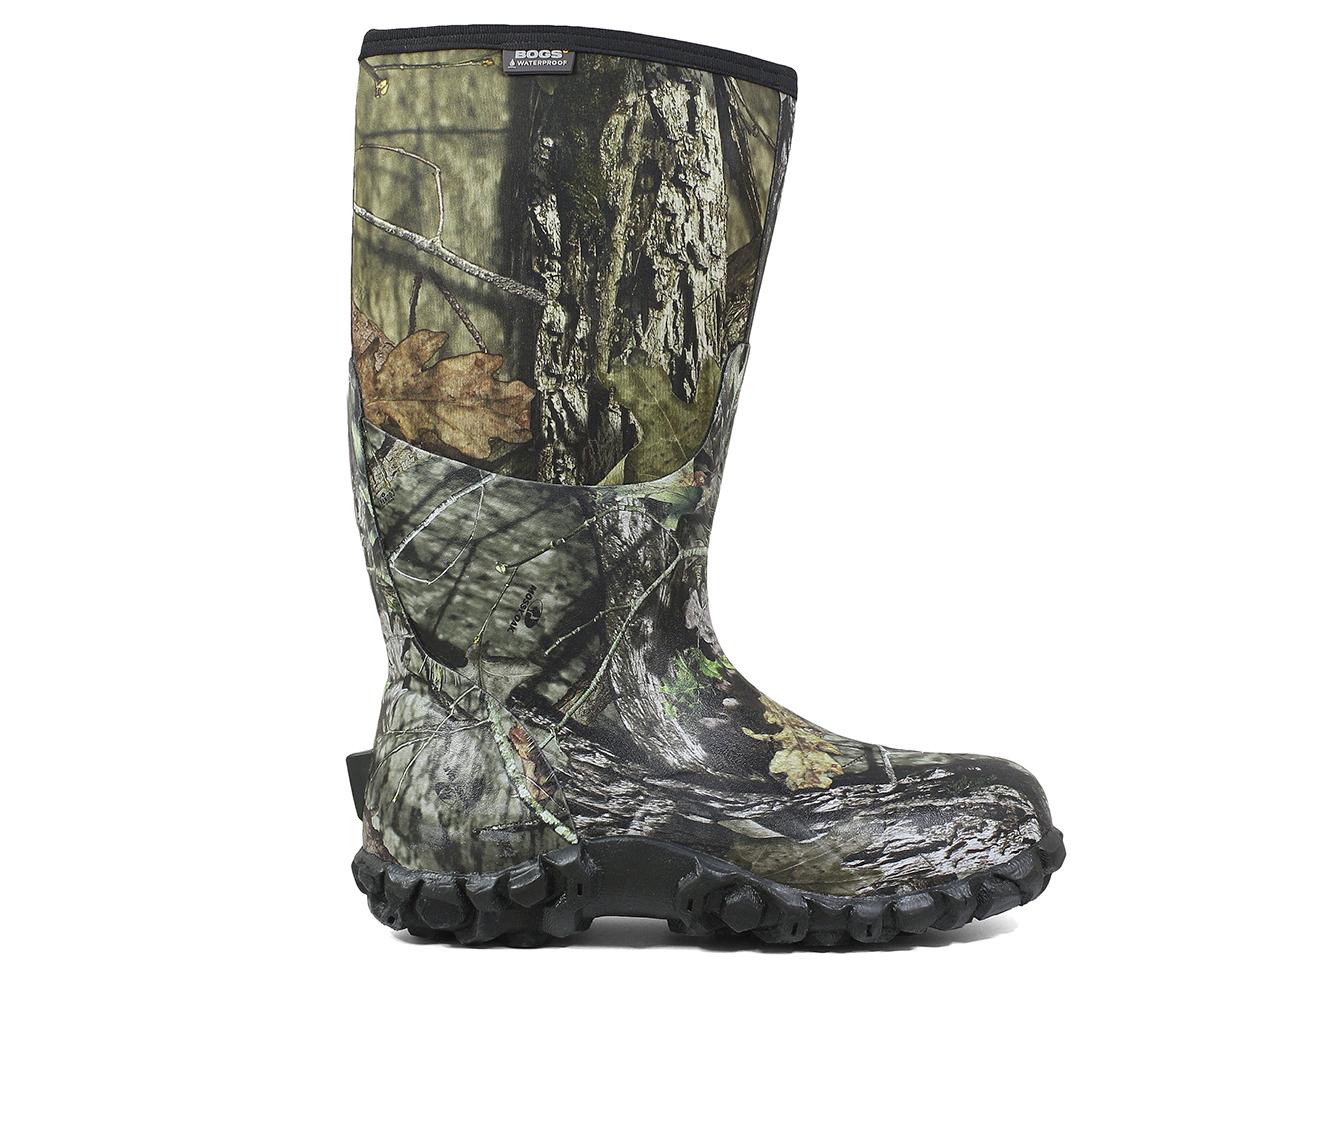 Bogs Footwear Classic Camo Men's Boots (Multi-color Fabric)